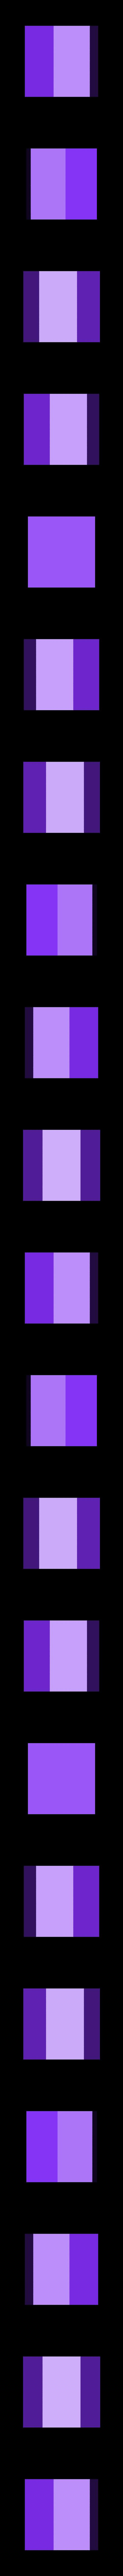 modular-hexagonal-wine-rack.stl Download free STL file Modular Wine Rack • 3D printer object, O3D